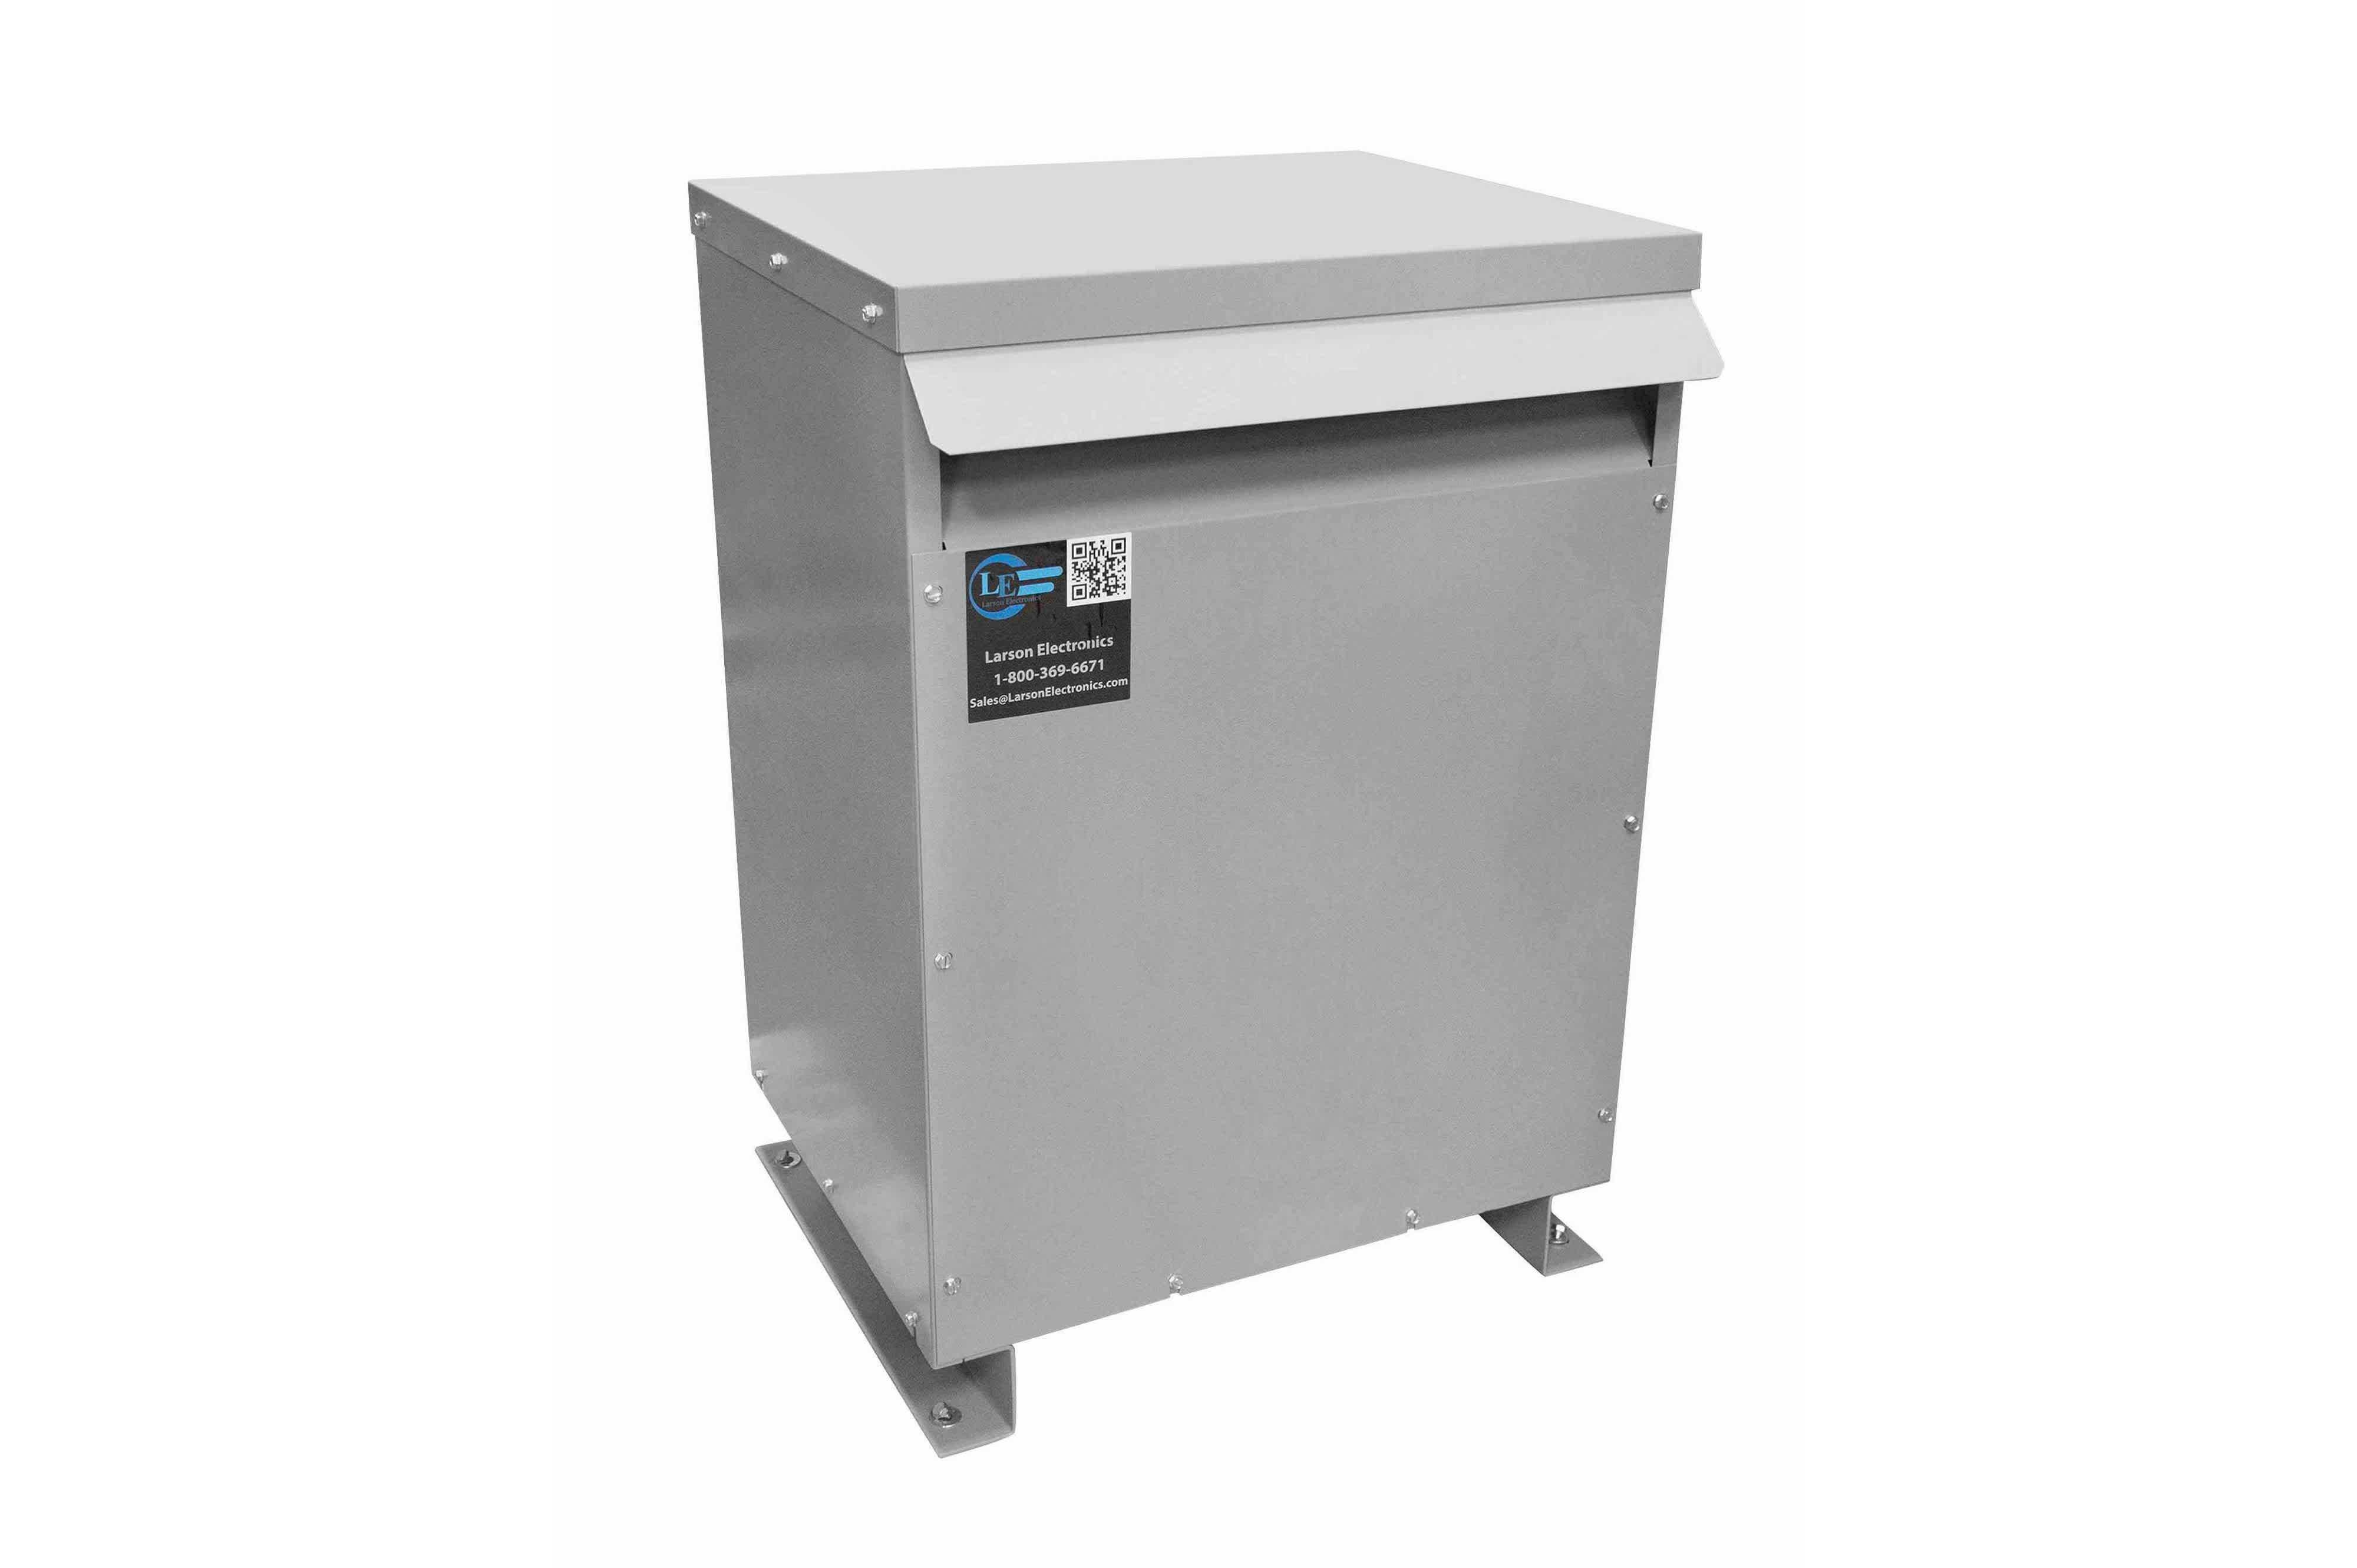 27 kVA 3PH Isolation Transformer, 415V Wye Primary, 240V/120 Delta Secondary, N3R, Ventilated, 60 Hz